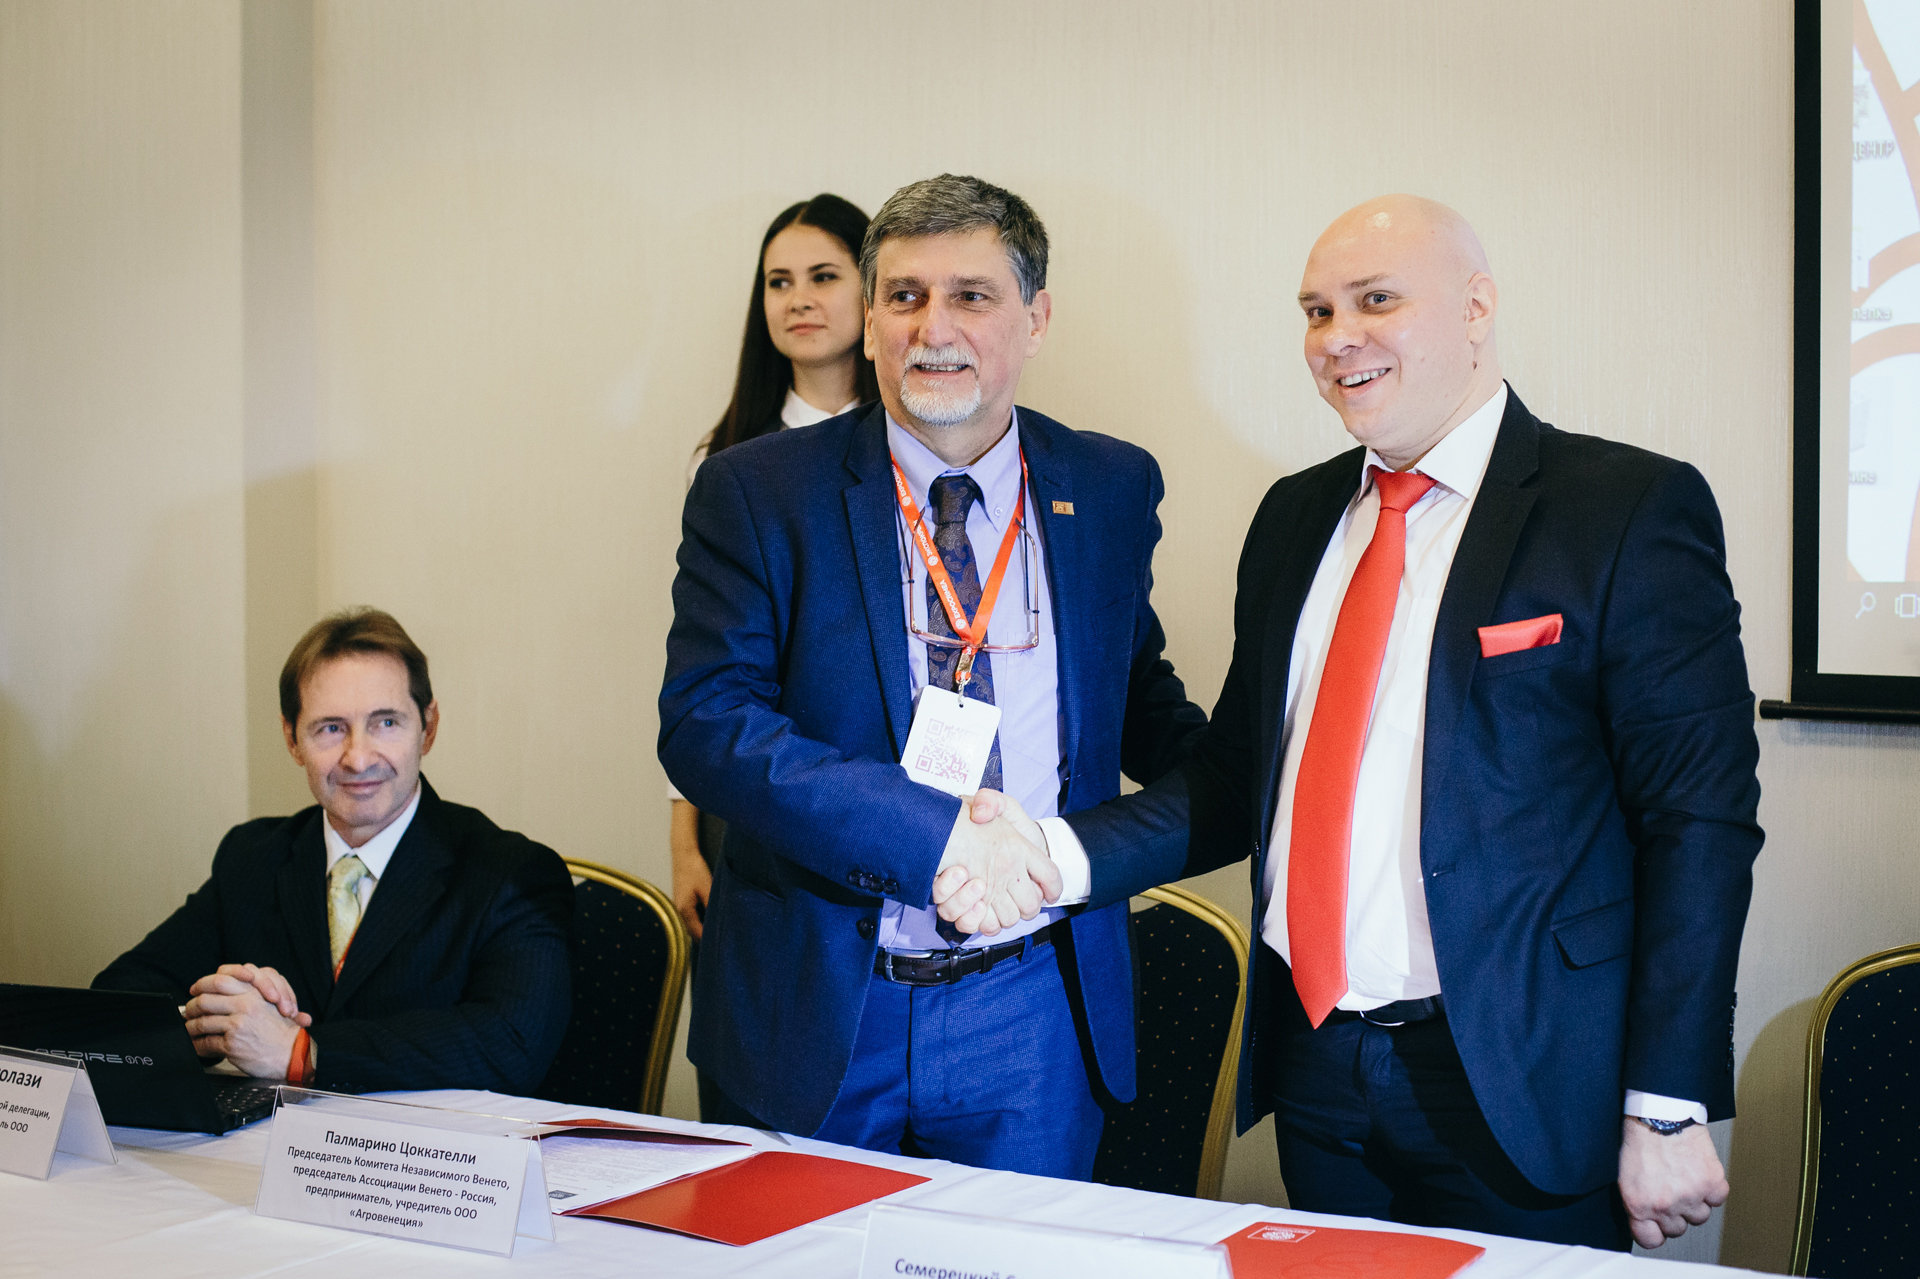 Palmarino Zoccatelli, Sergej Semeretskij